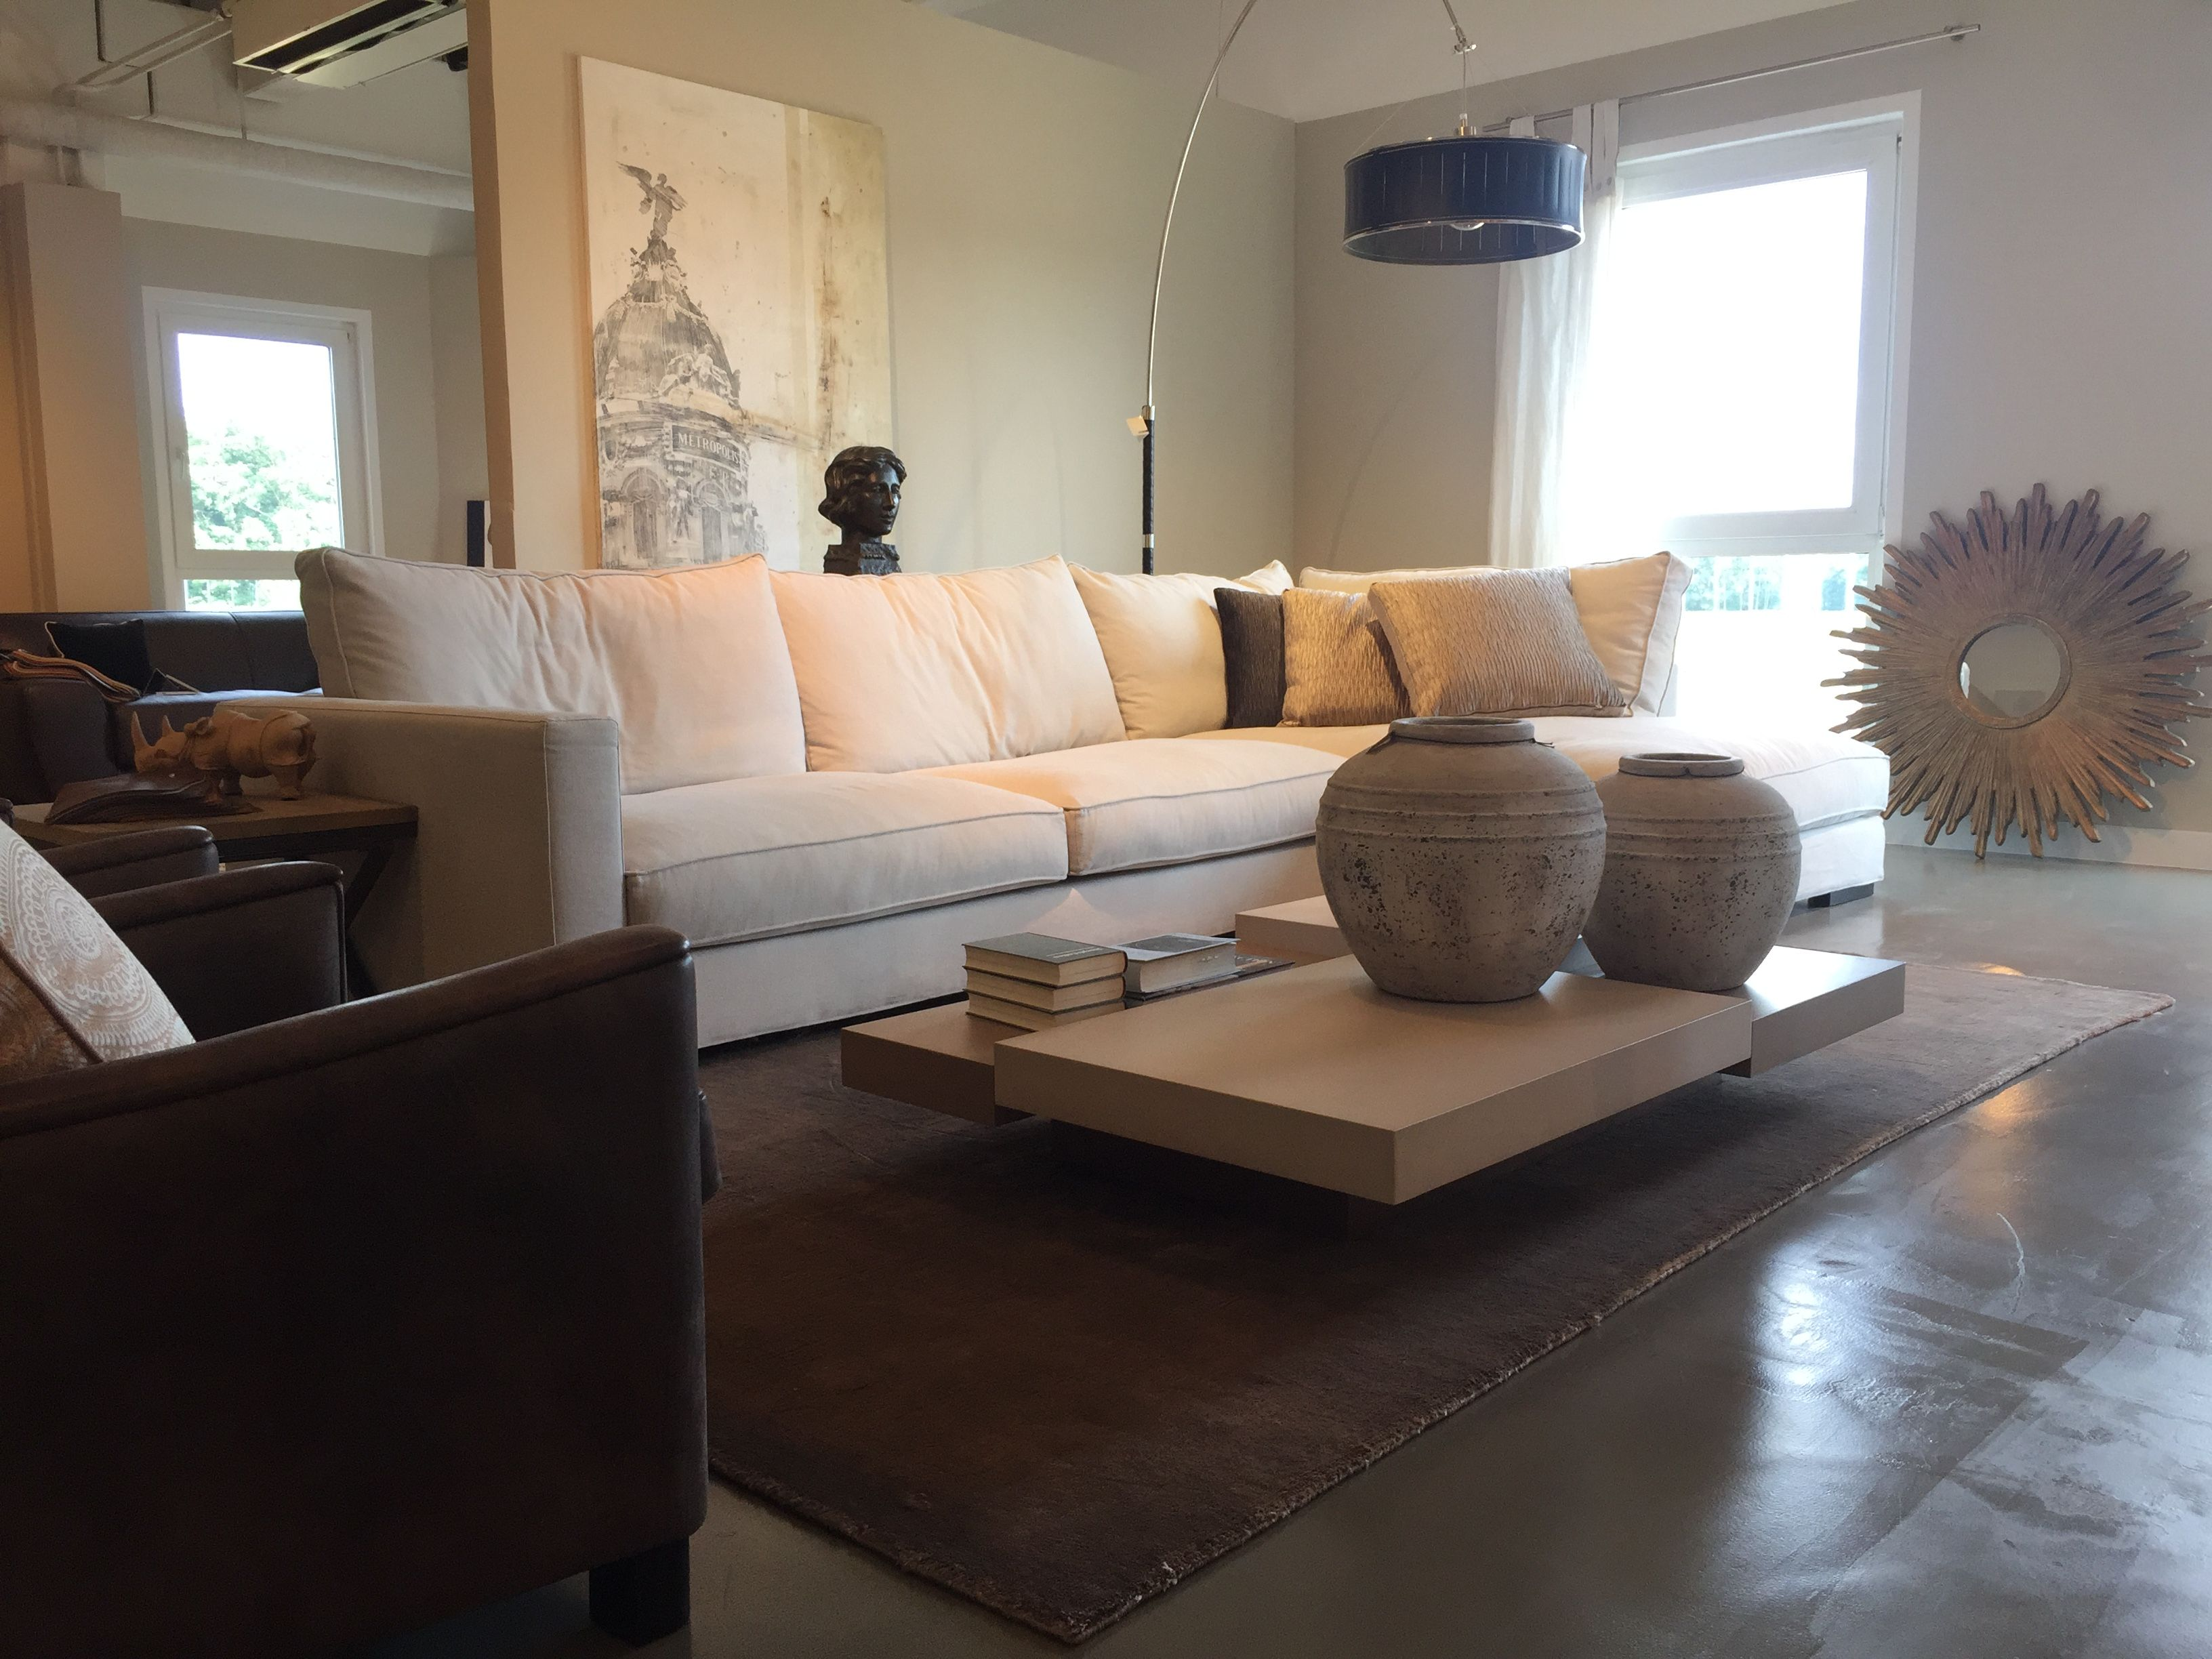 long island sofa roche bobois erlangen n rnberg home design living room furniture sofa